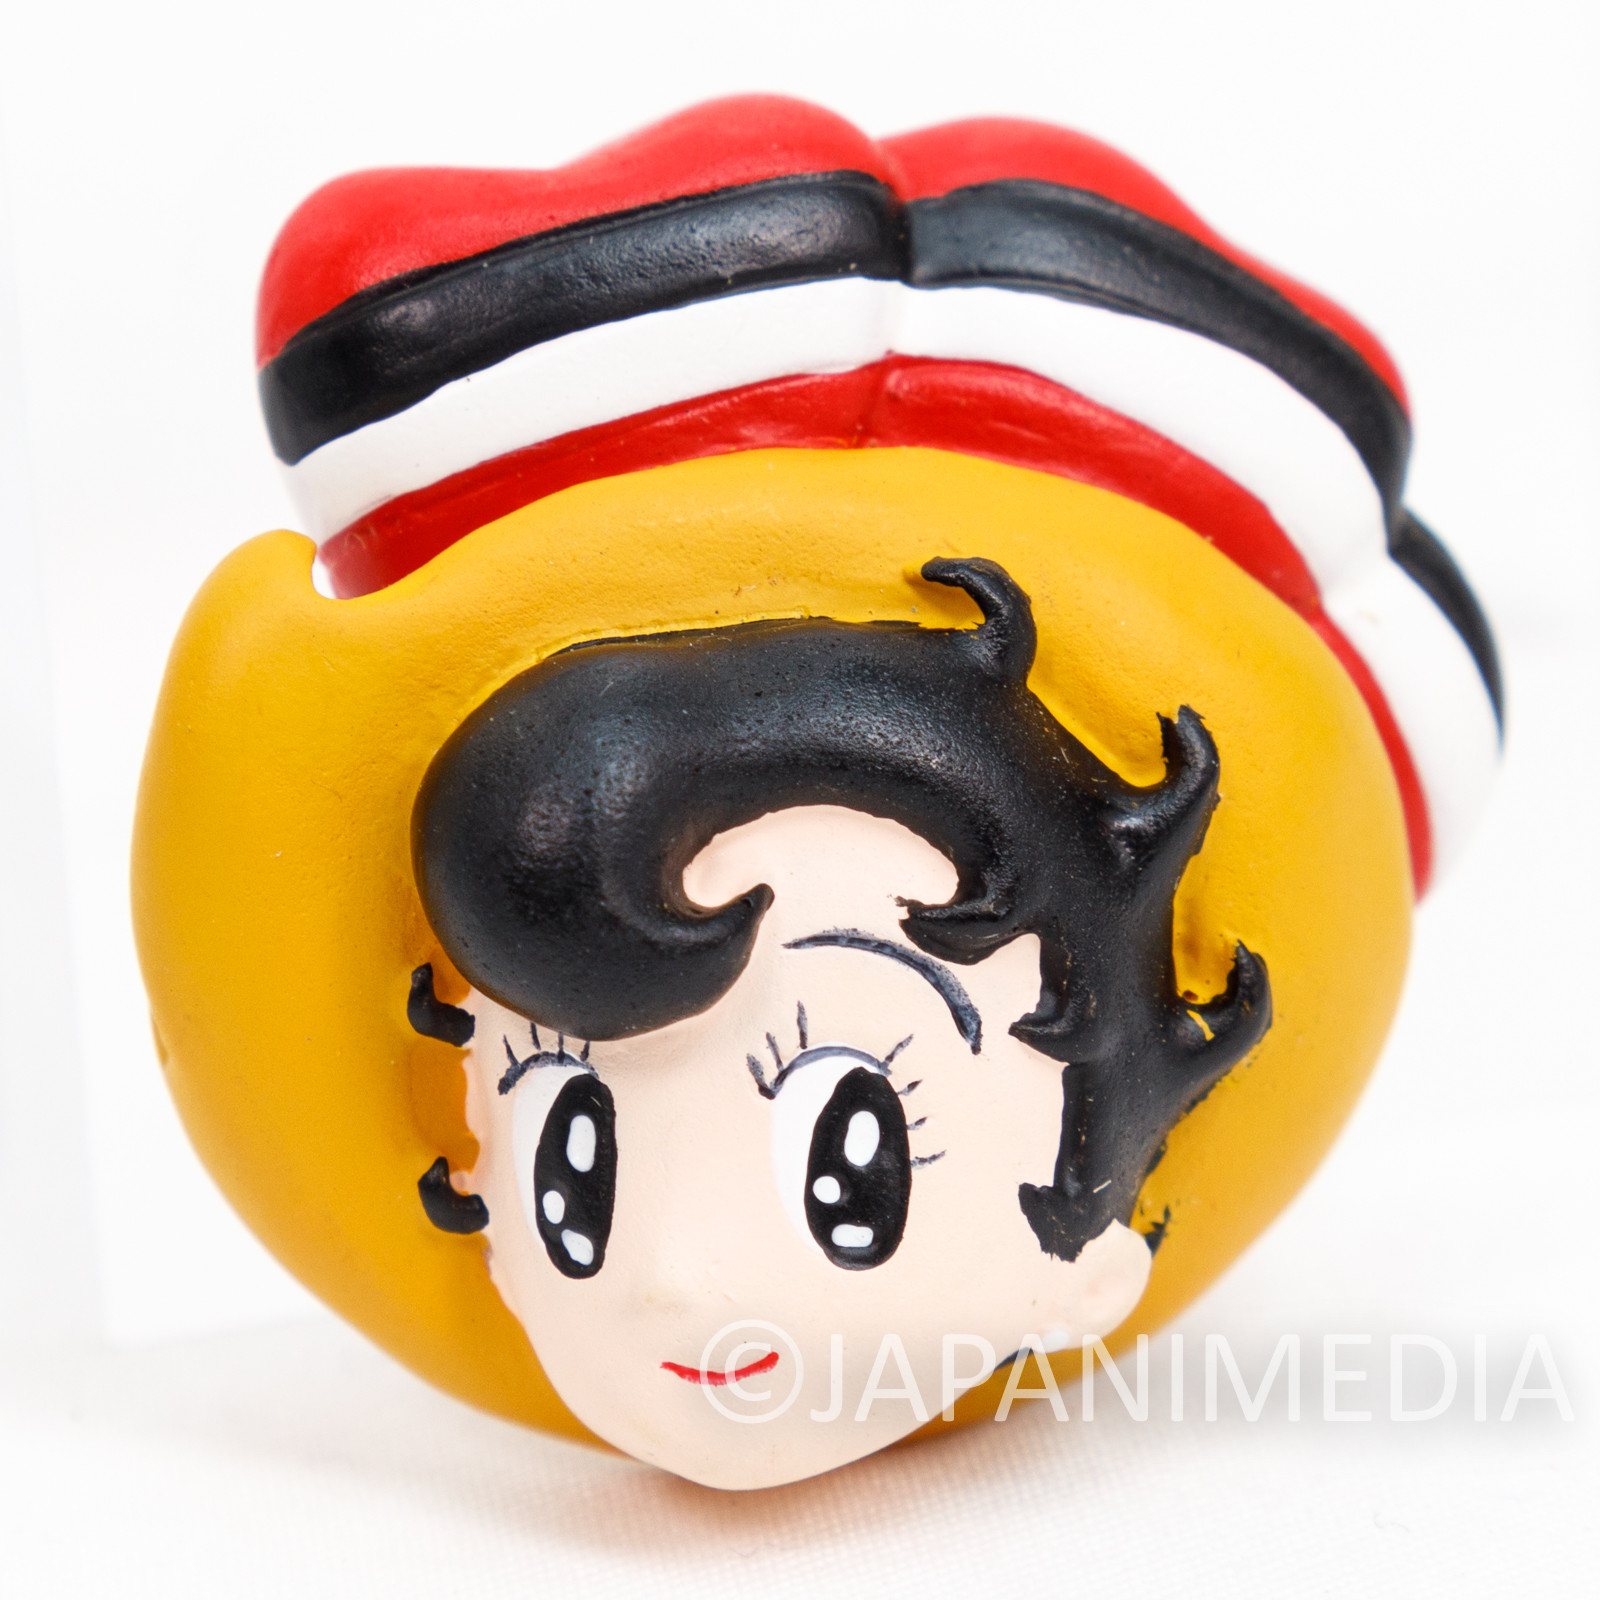 Retro RARE! Princess Knight Sapphire Mascot Figure Magnet Osamu Tezuka JAPAN